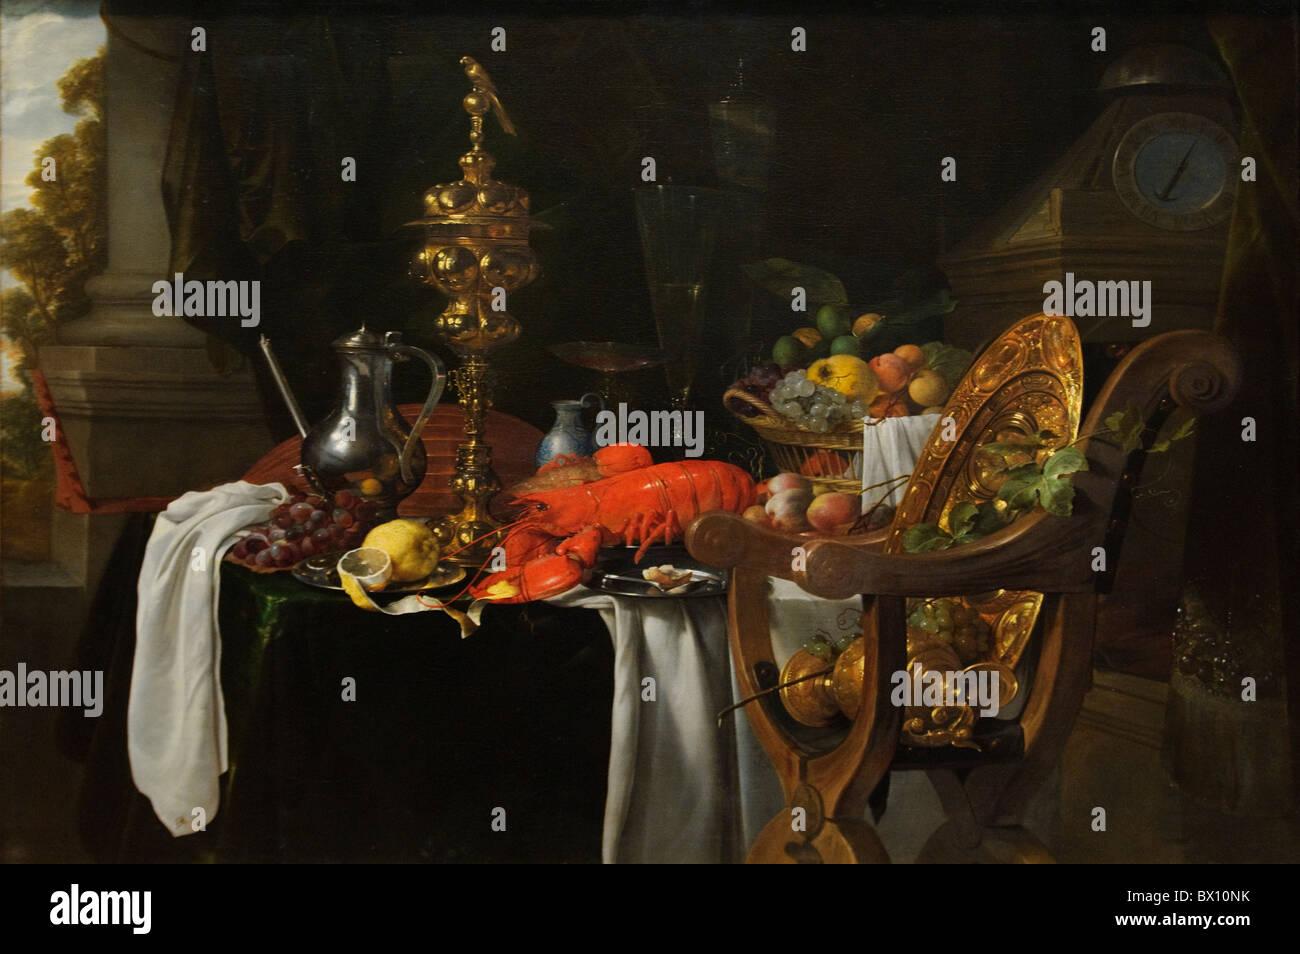 Ancora in vita: una scena di Banqueting, di Jan Davidsz de Heem Foto Stock